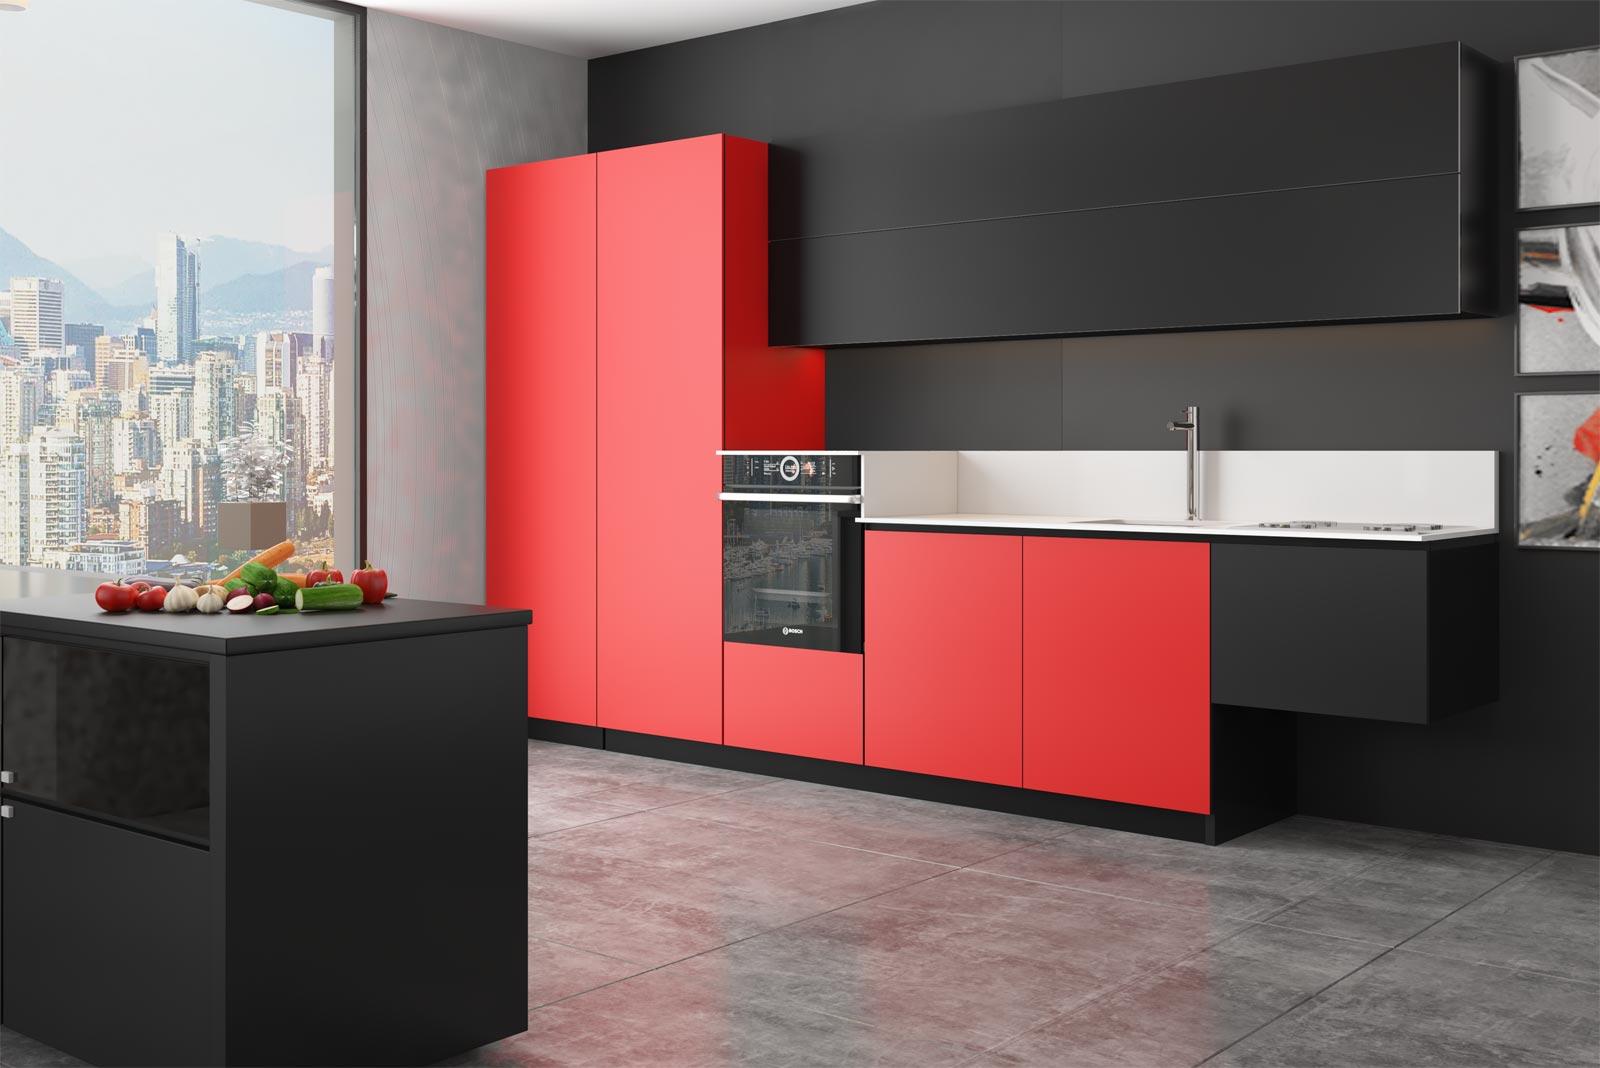 Arredamento moderno di design cucine moderne replace design for Arredamento di design tedesco